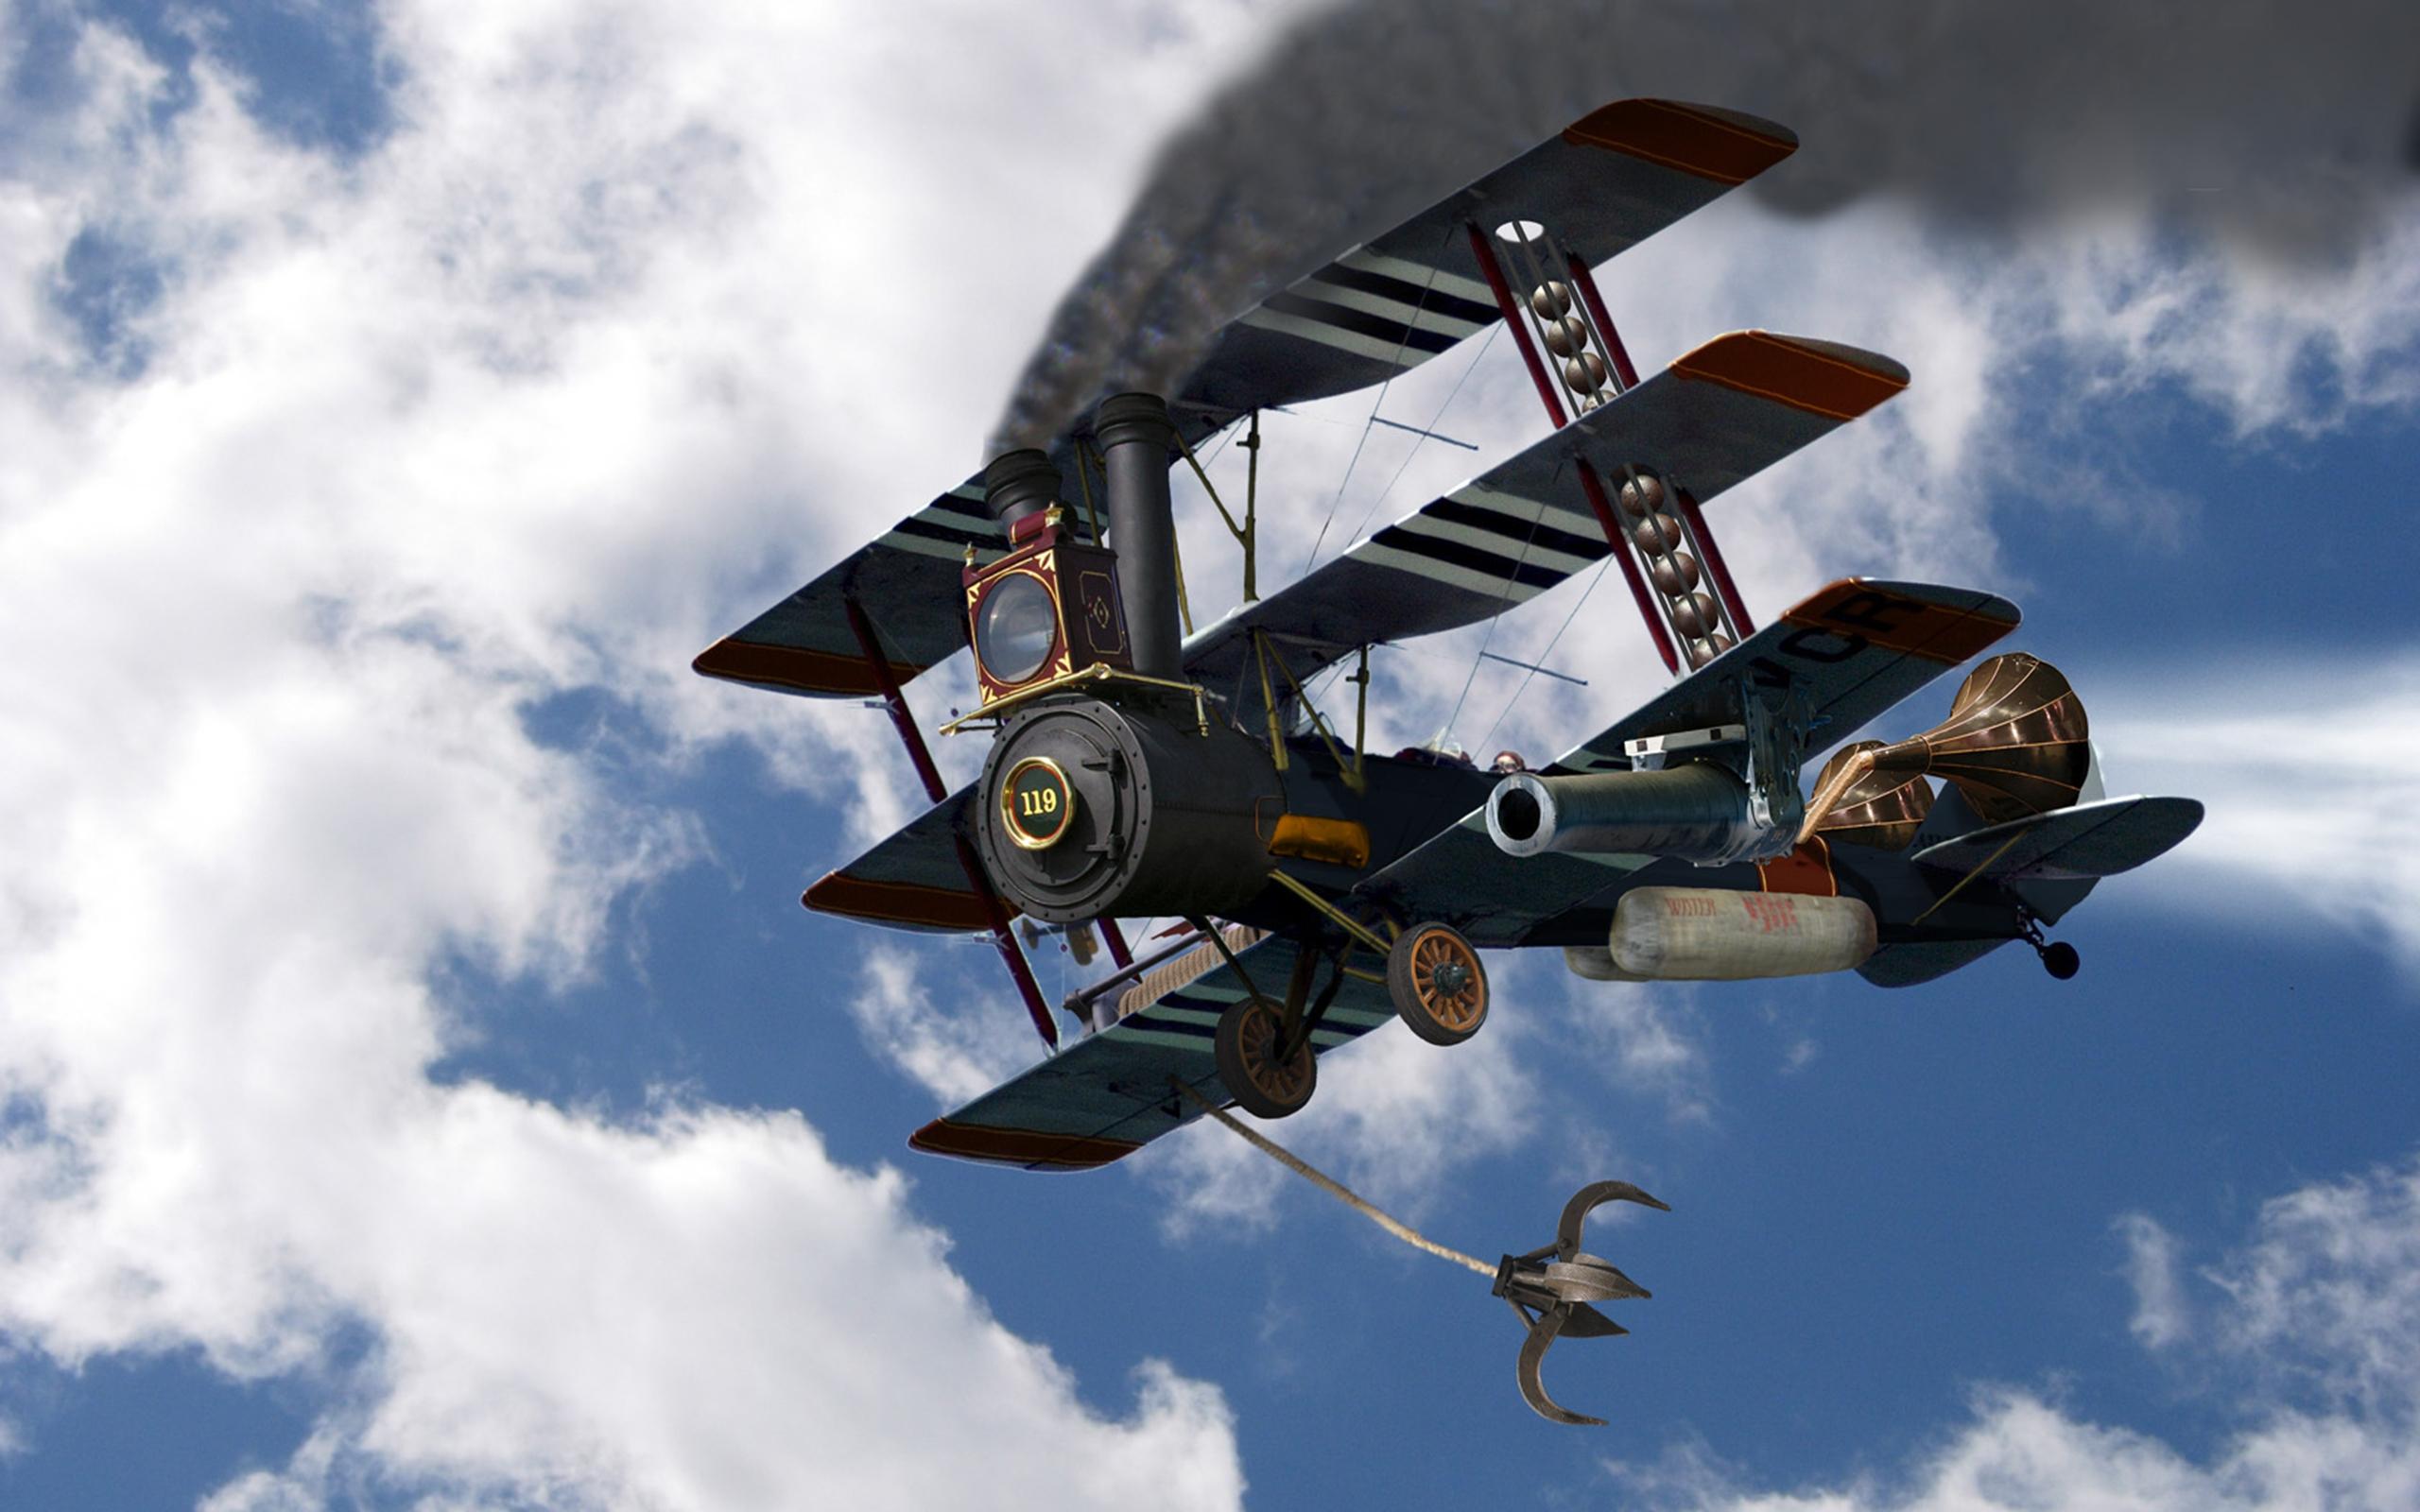 Steampunk Aircraft Wallpapers  2560x1600 1518296